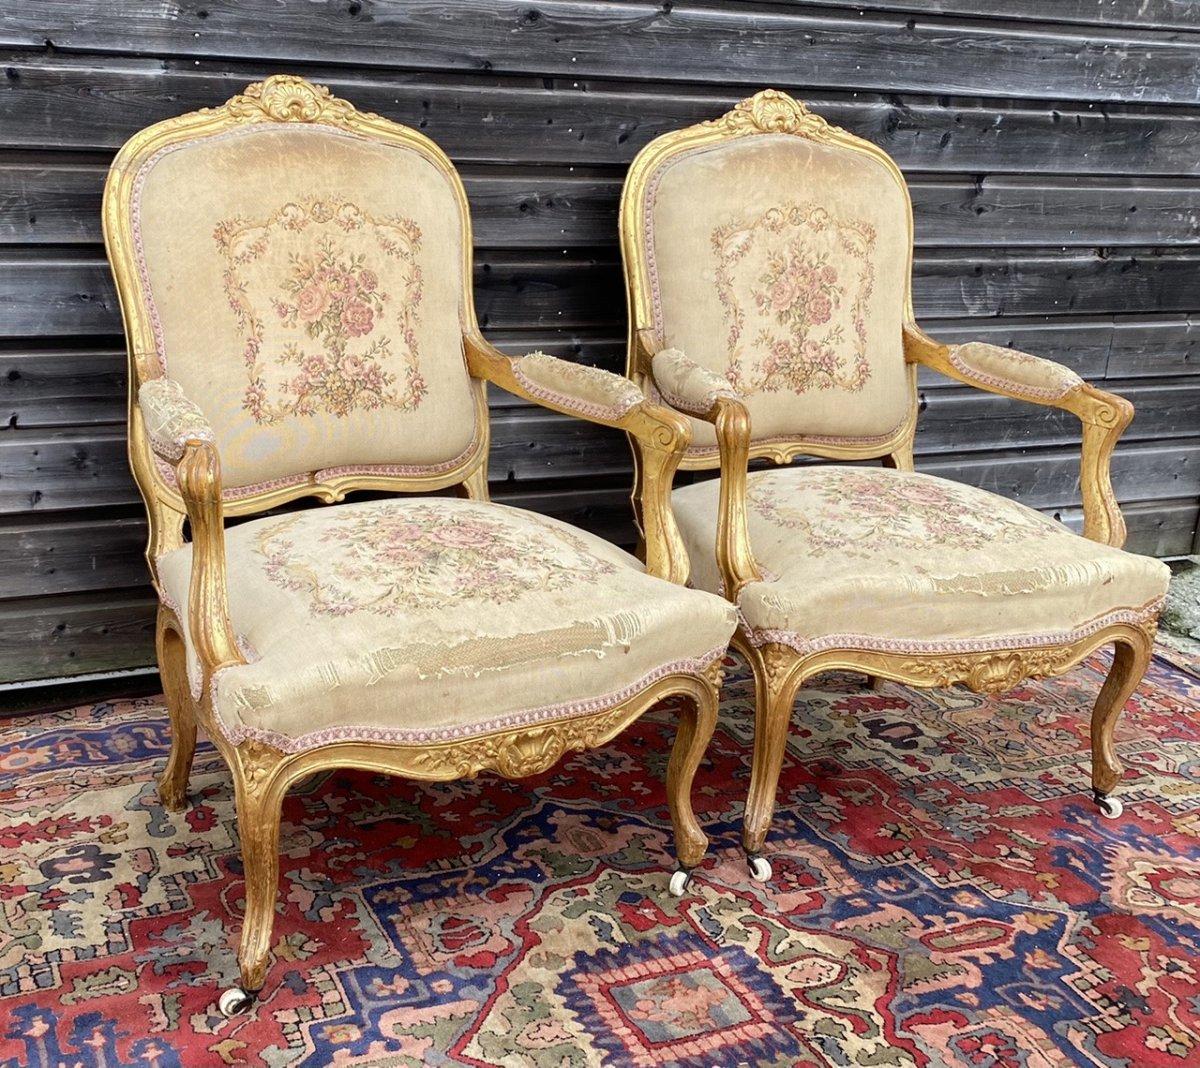 Living Room Furniture In Golden Wood XIX Eme Century-photo-4